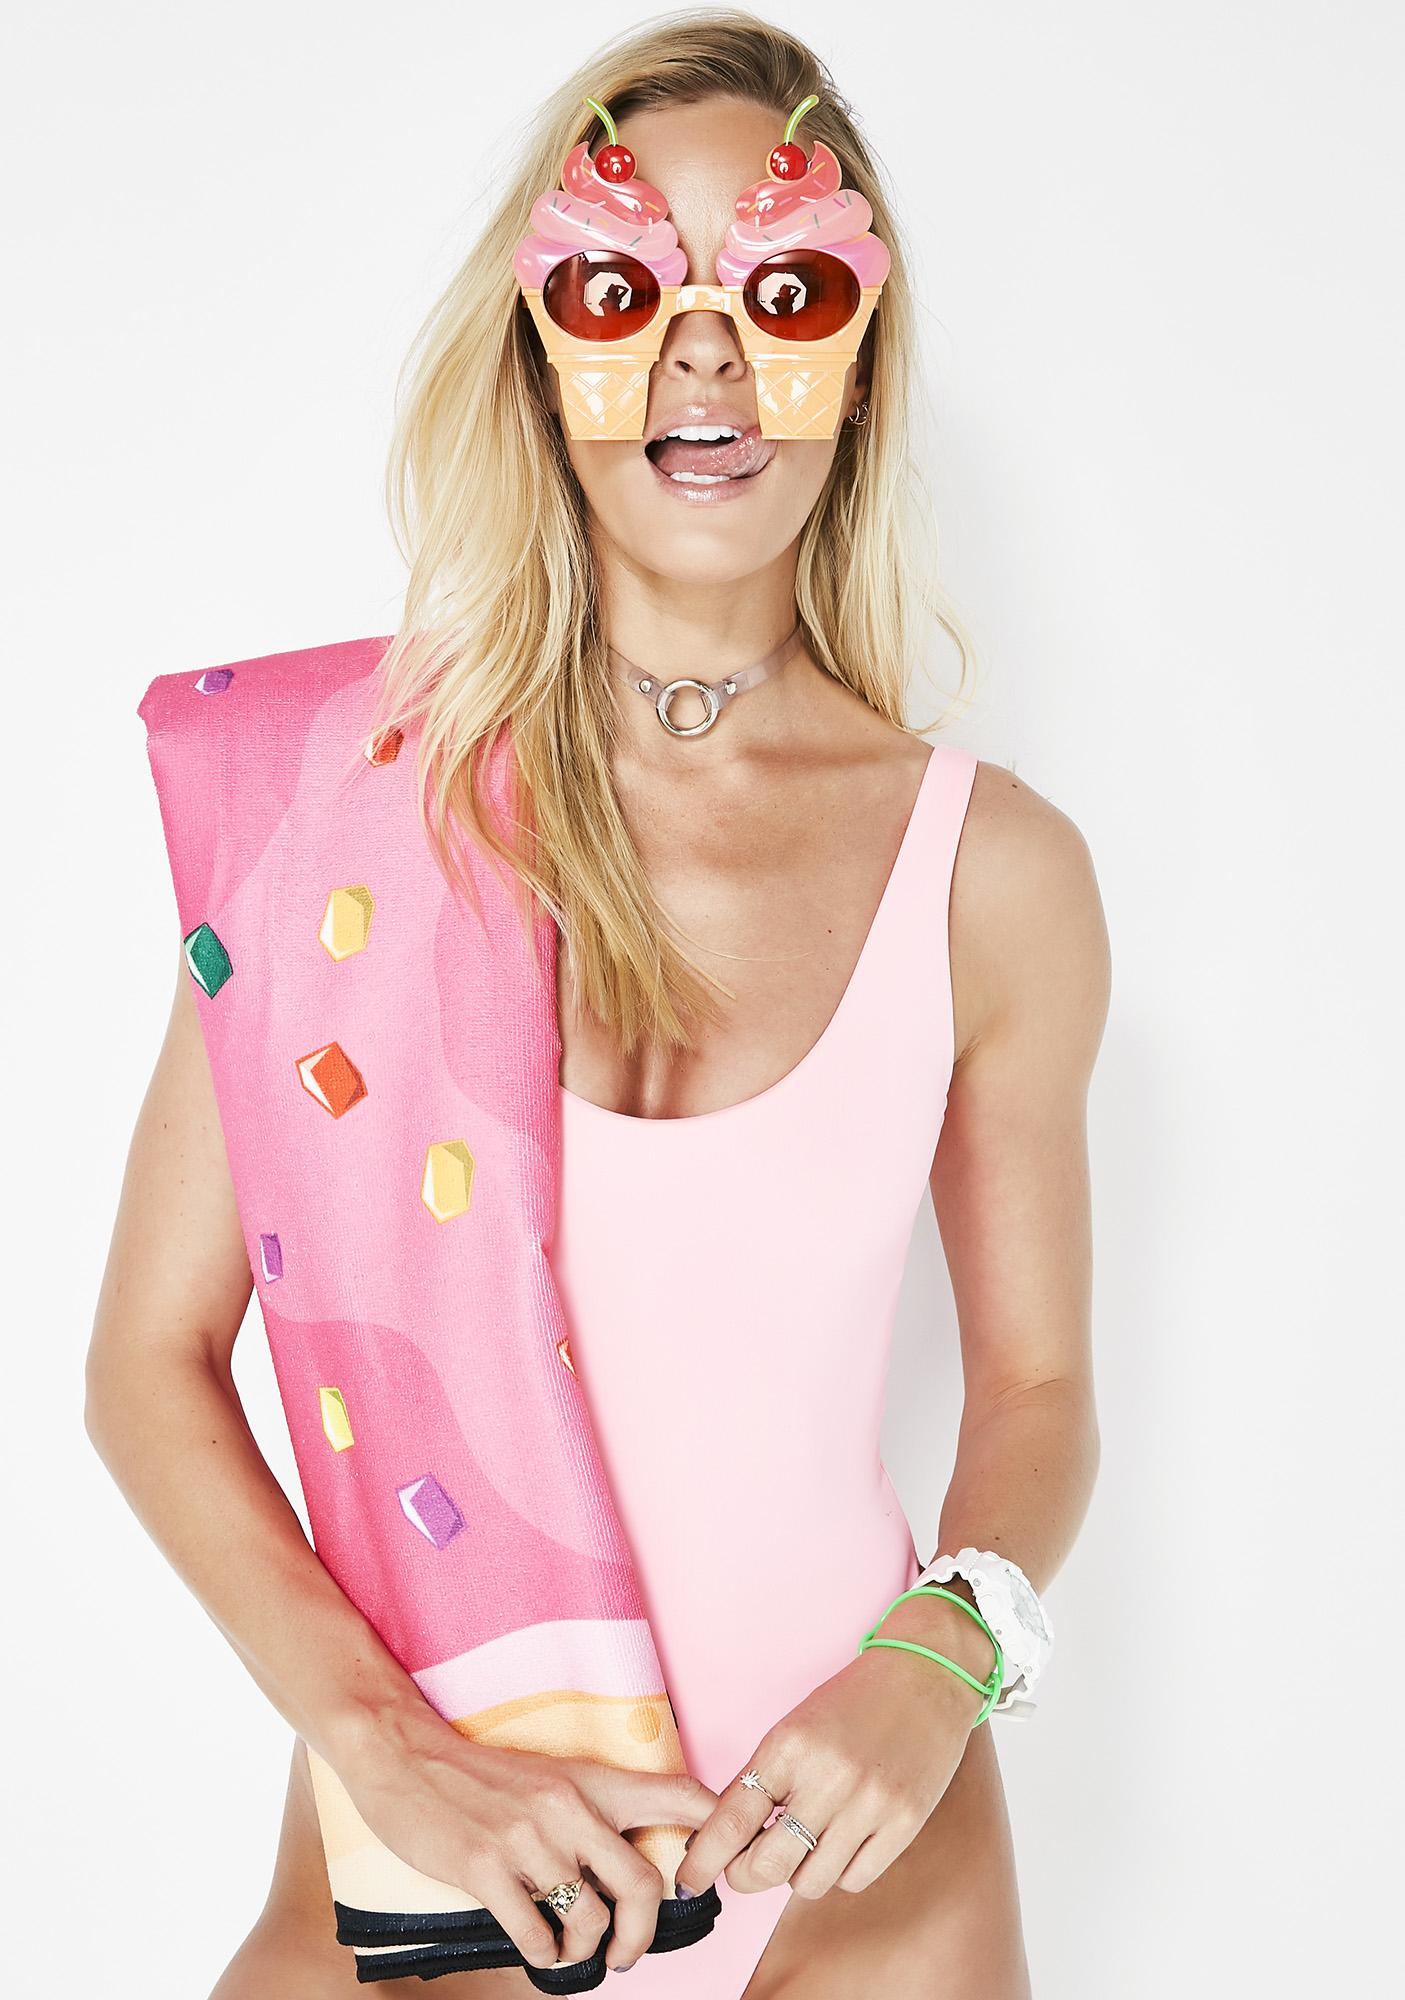 How Many Licks Sunglasses